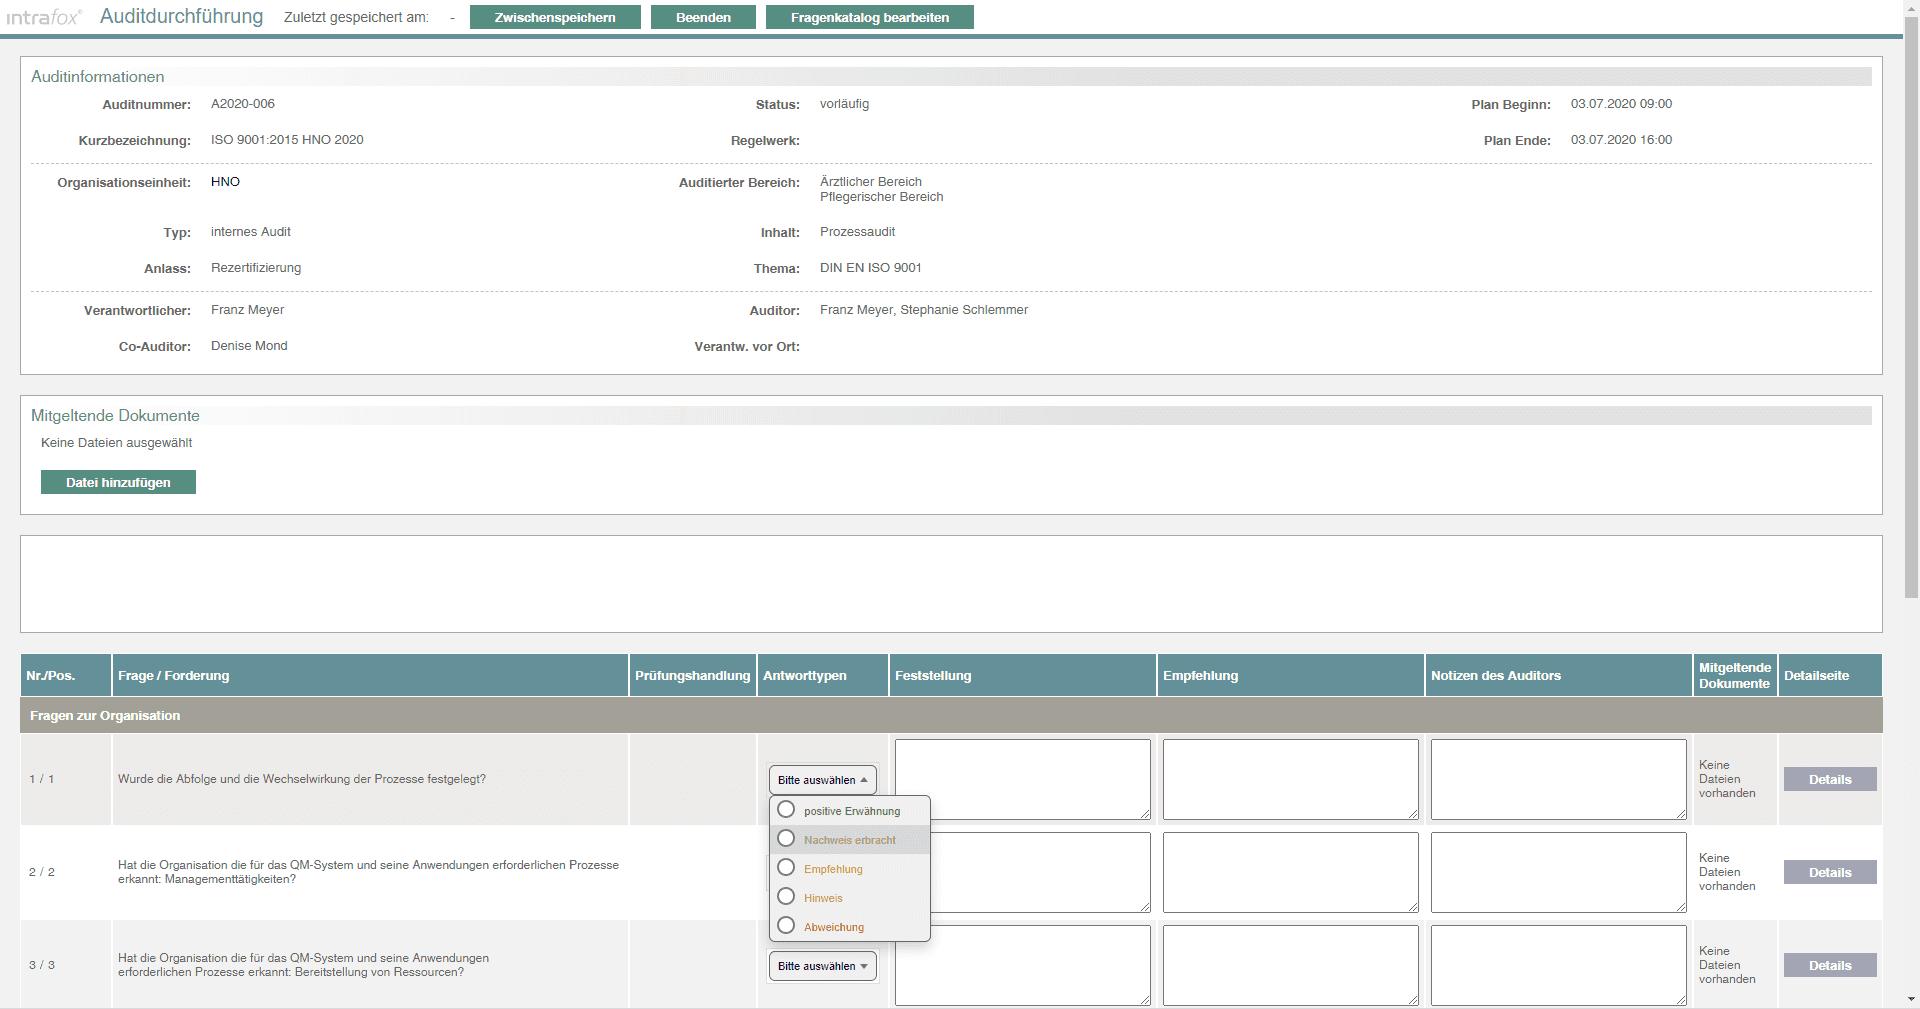 Auditmanagement Software - Audits im Krankenhaus